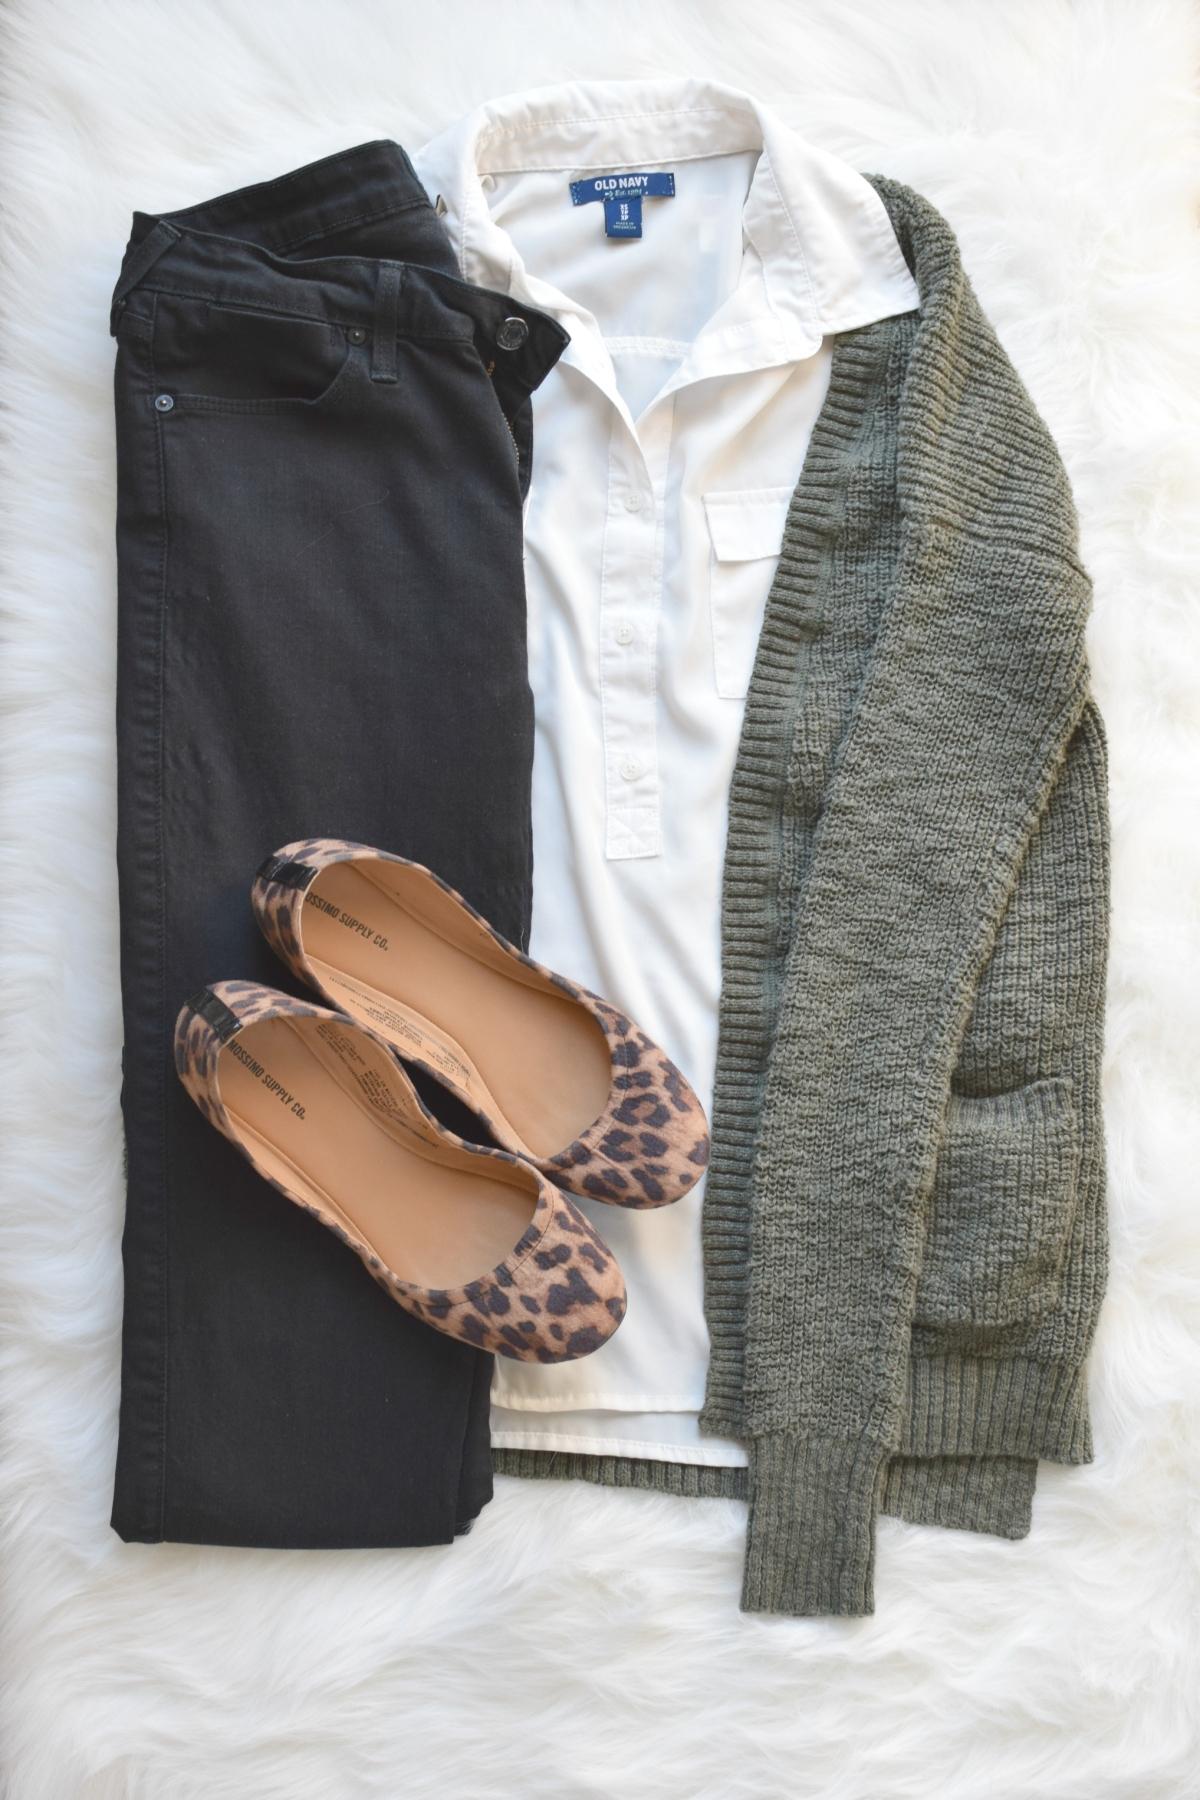 Olive and leopard |www.pearlsandsportsbras.com|